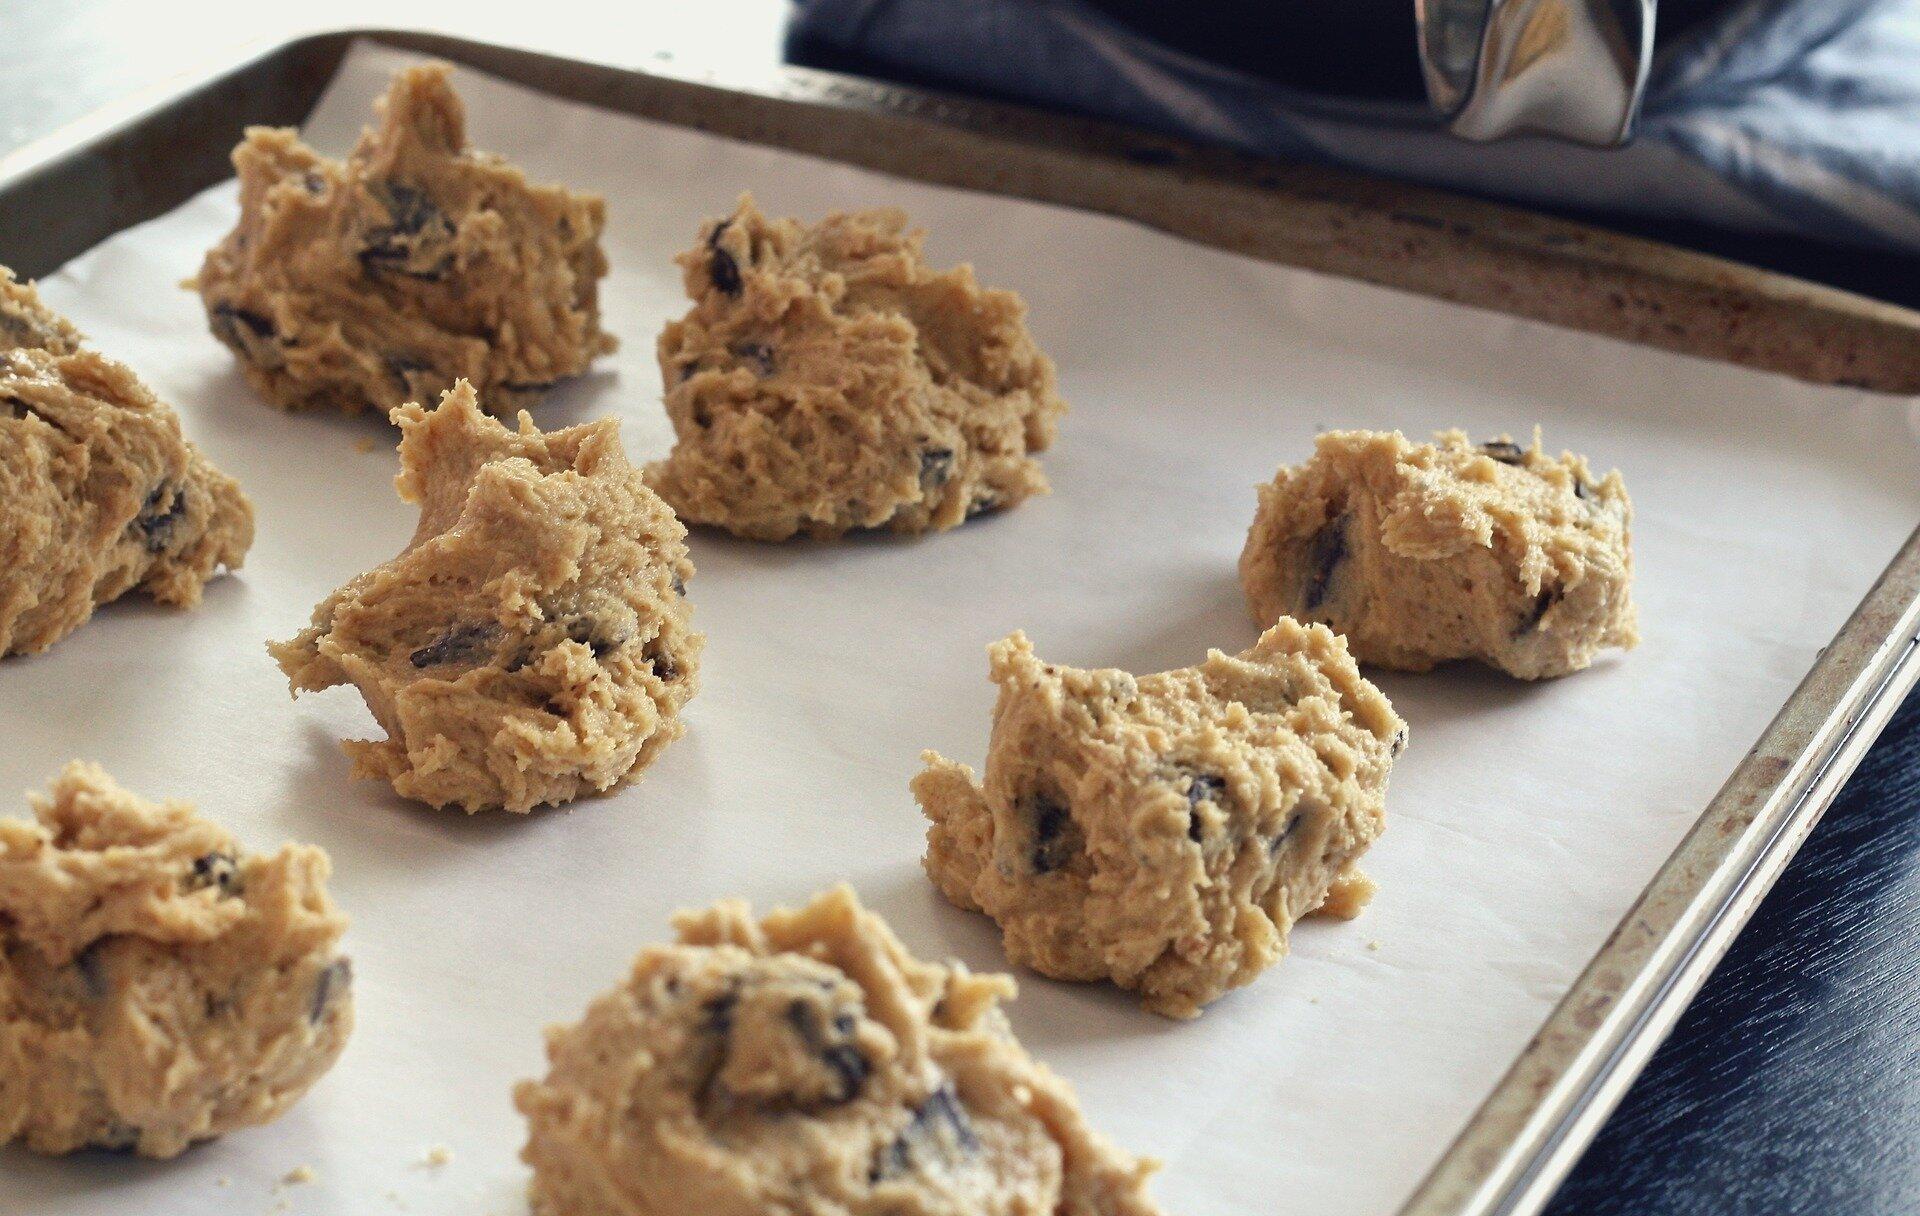 cookie-dough-1449456_1920.jpg